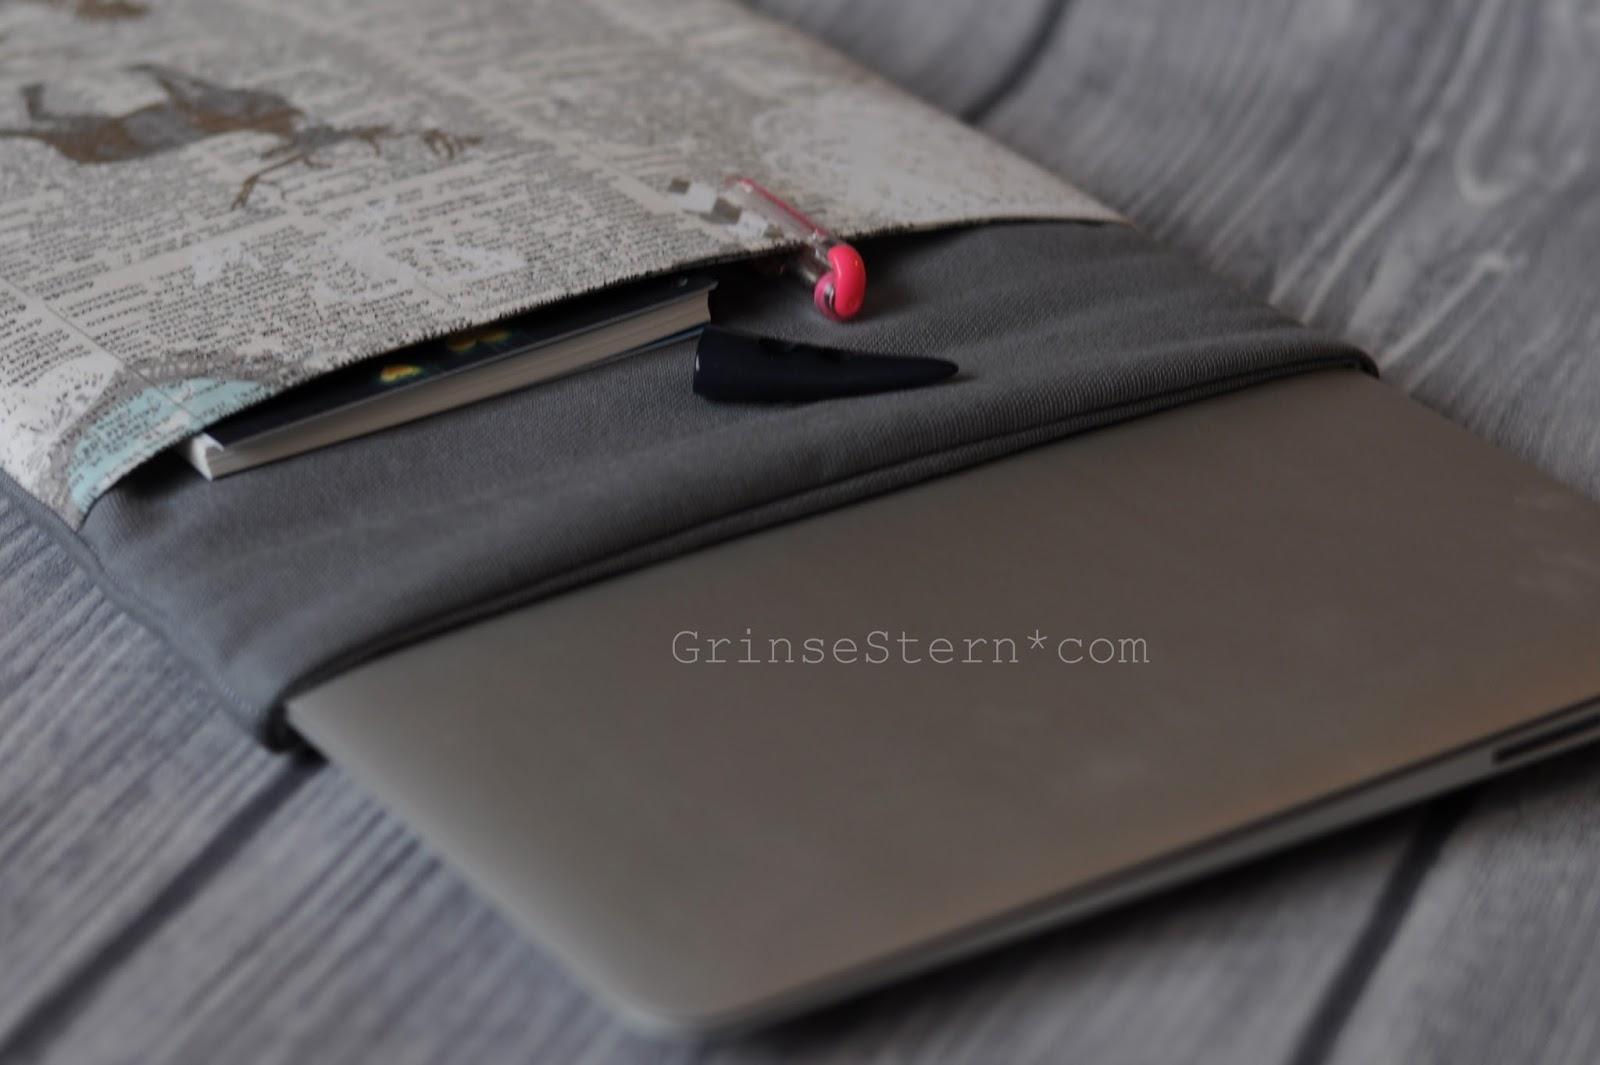 laptophülle, grinsestern, genäht